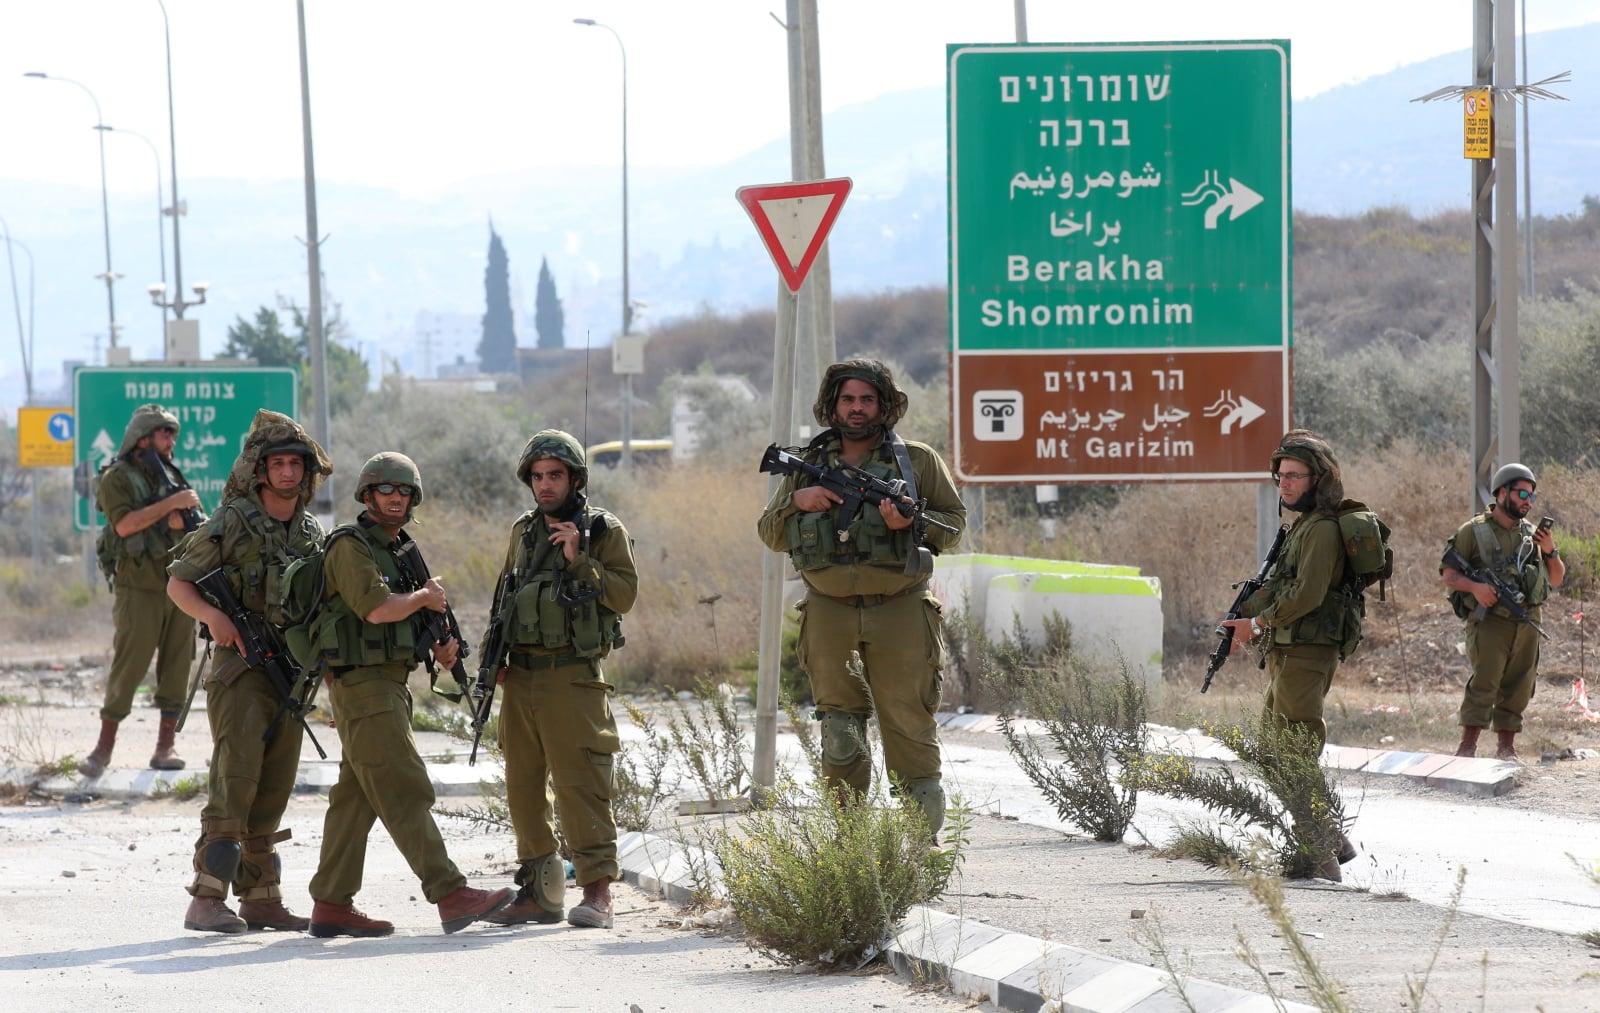 Konflikt palestyńsko - izraelski fot. EPA/ALAA BADARNEH